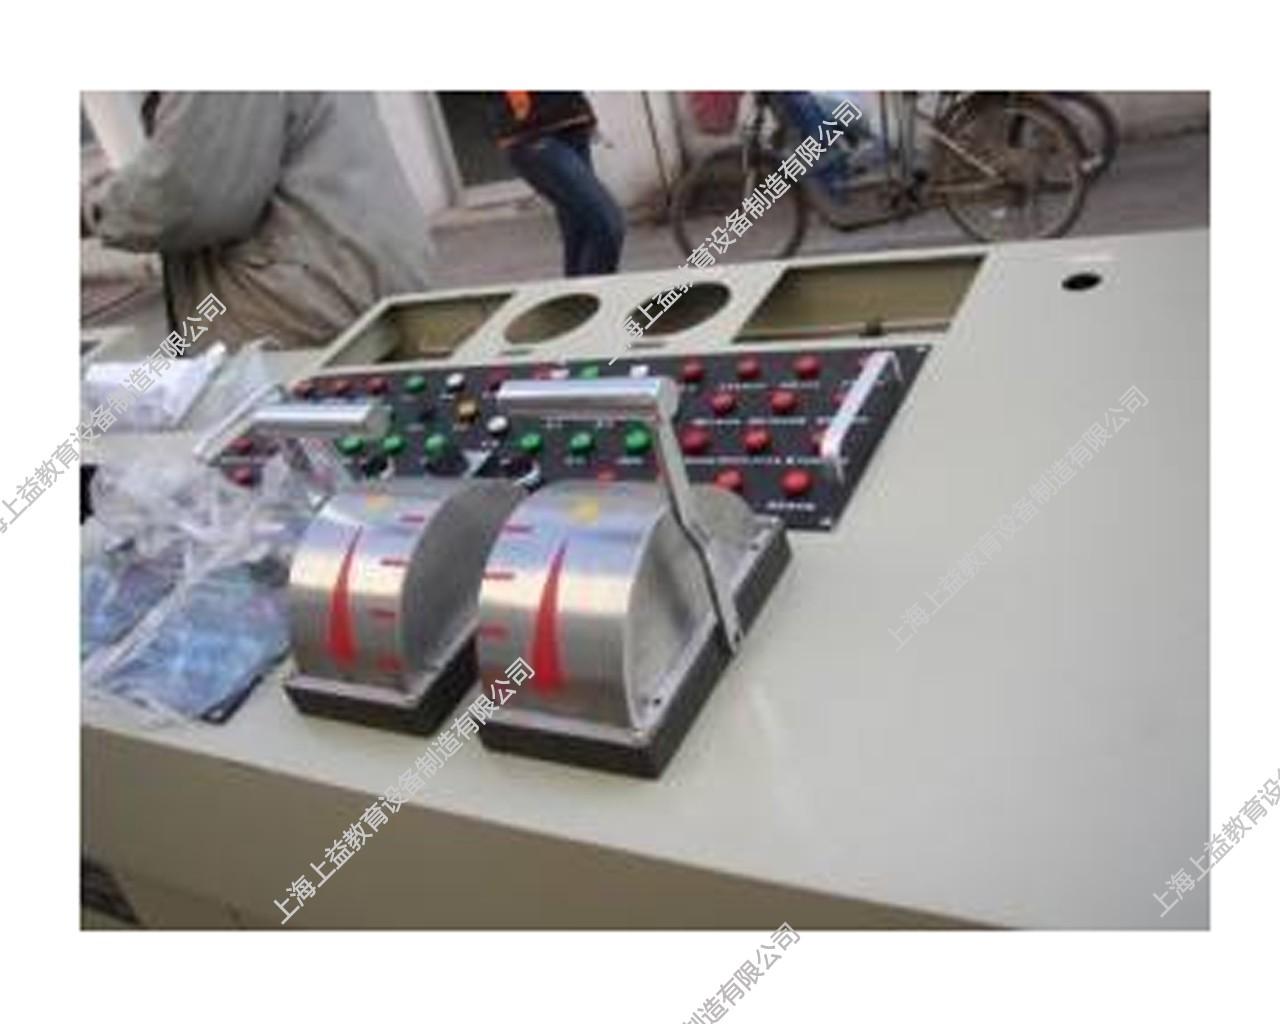 SYCBK-09 船用主备泵自动控制系统wwwlehu8vip装置